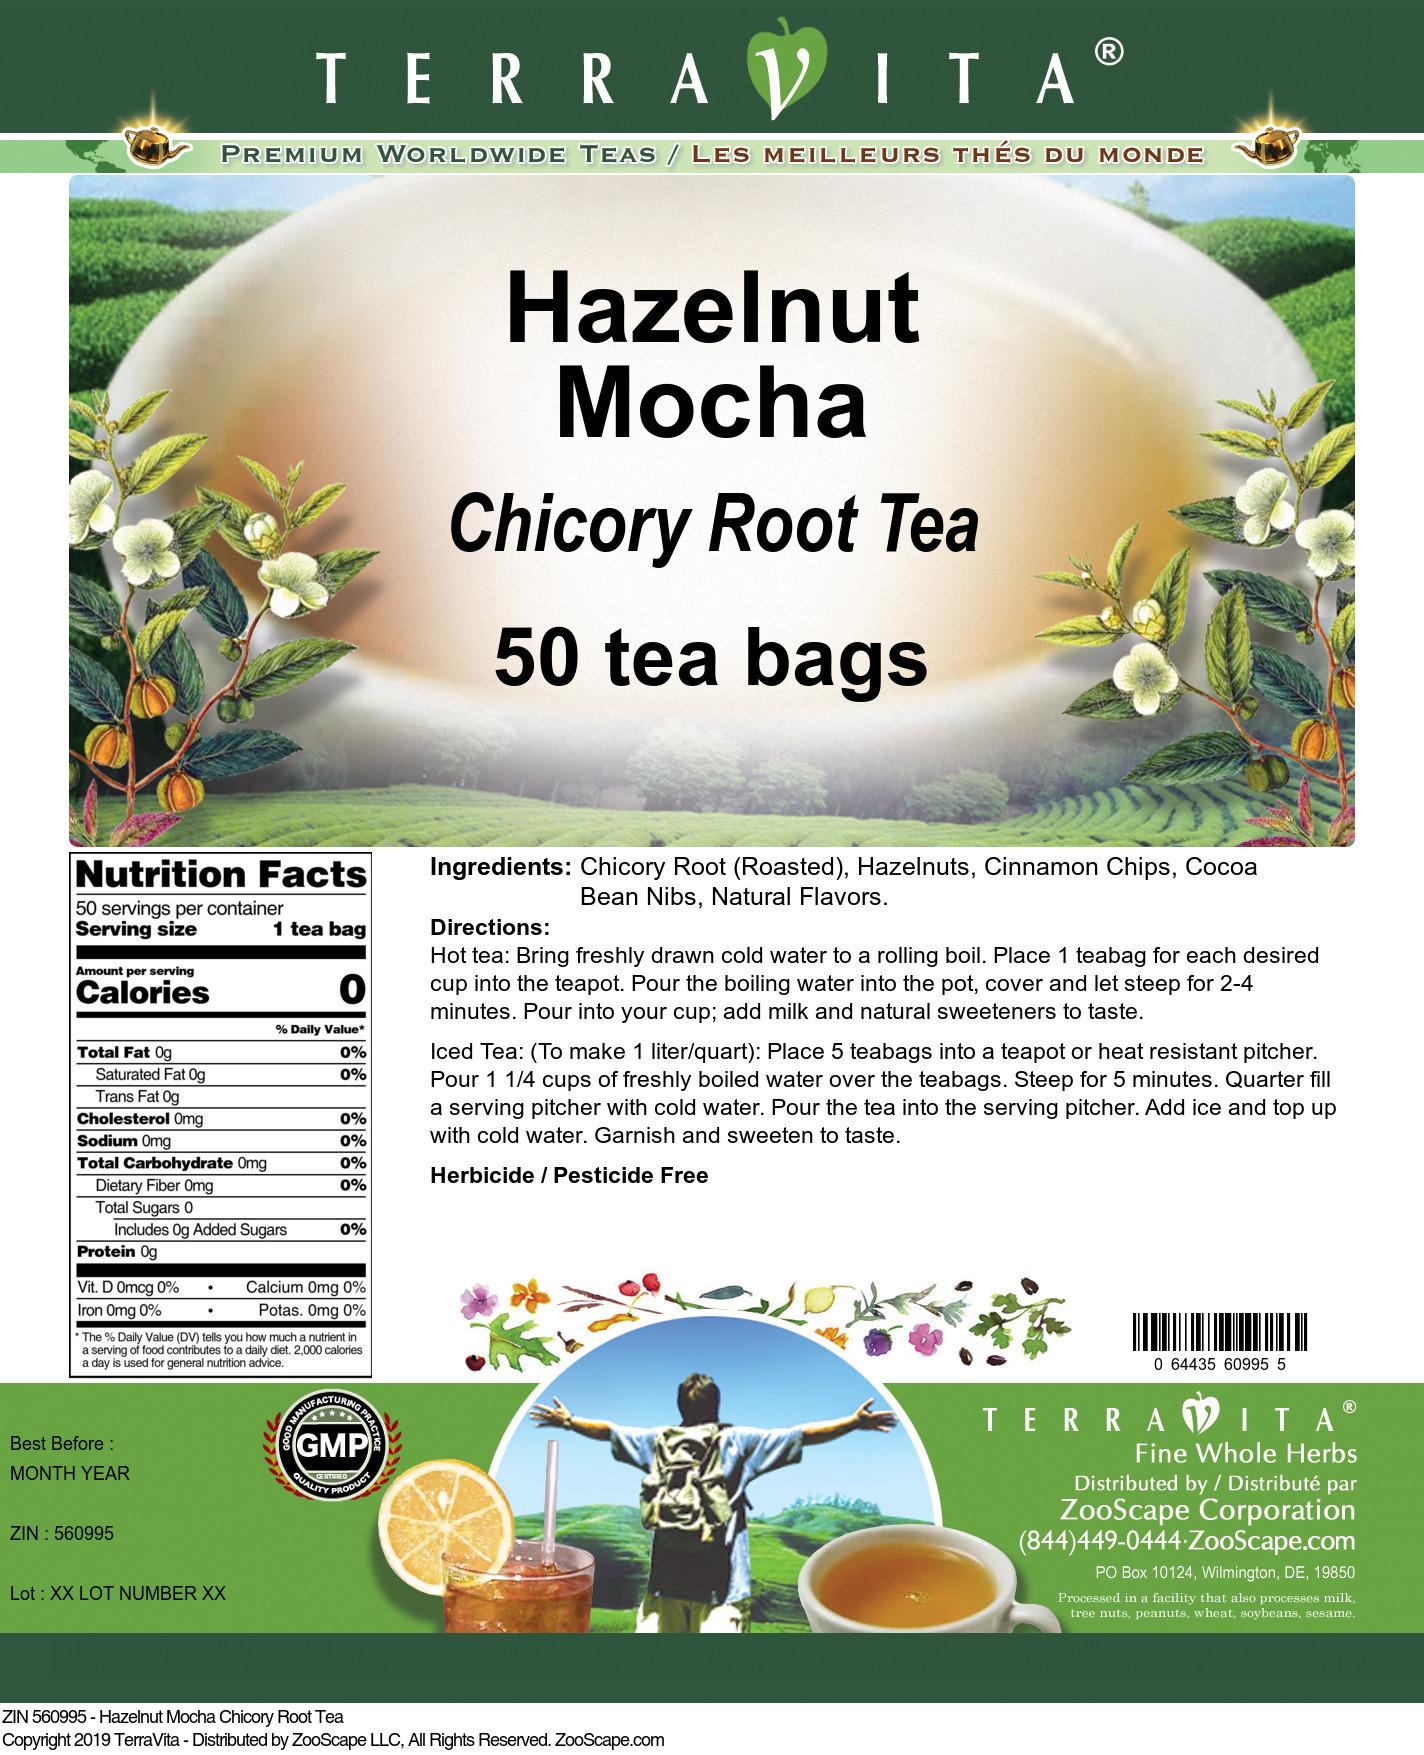 Hazelnut Mocha Chicory Root Tea